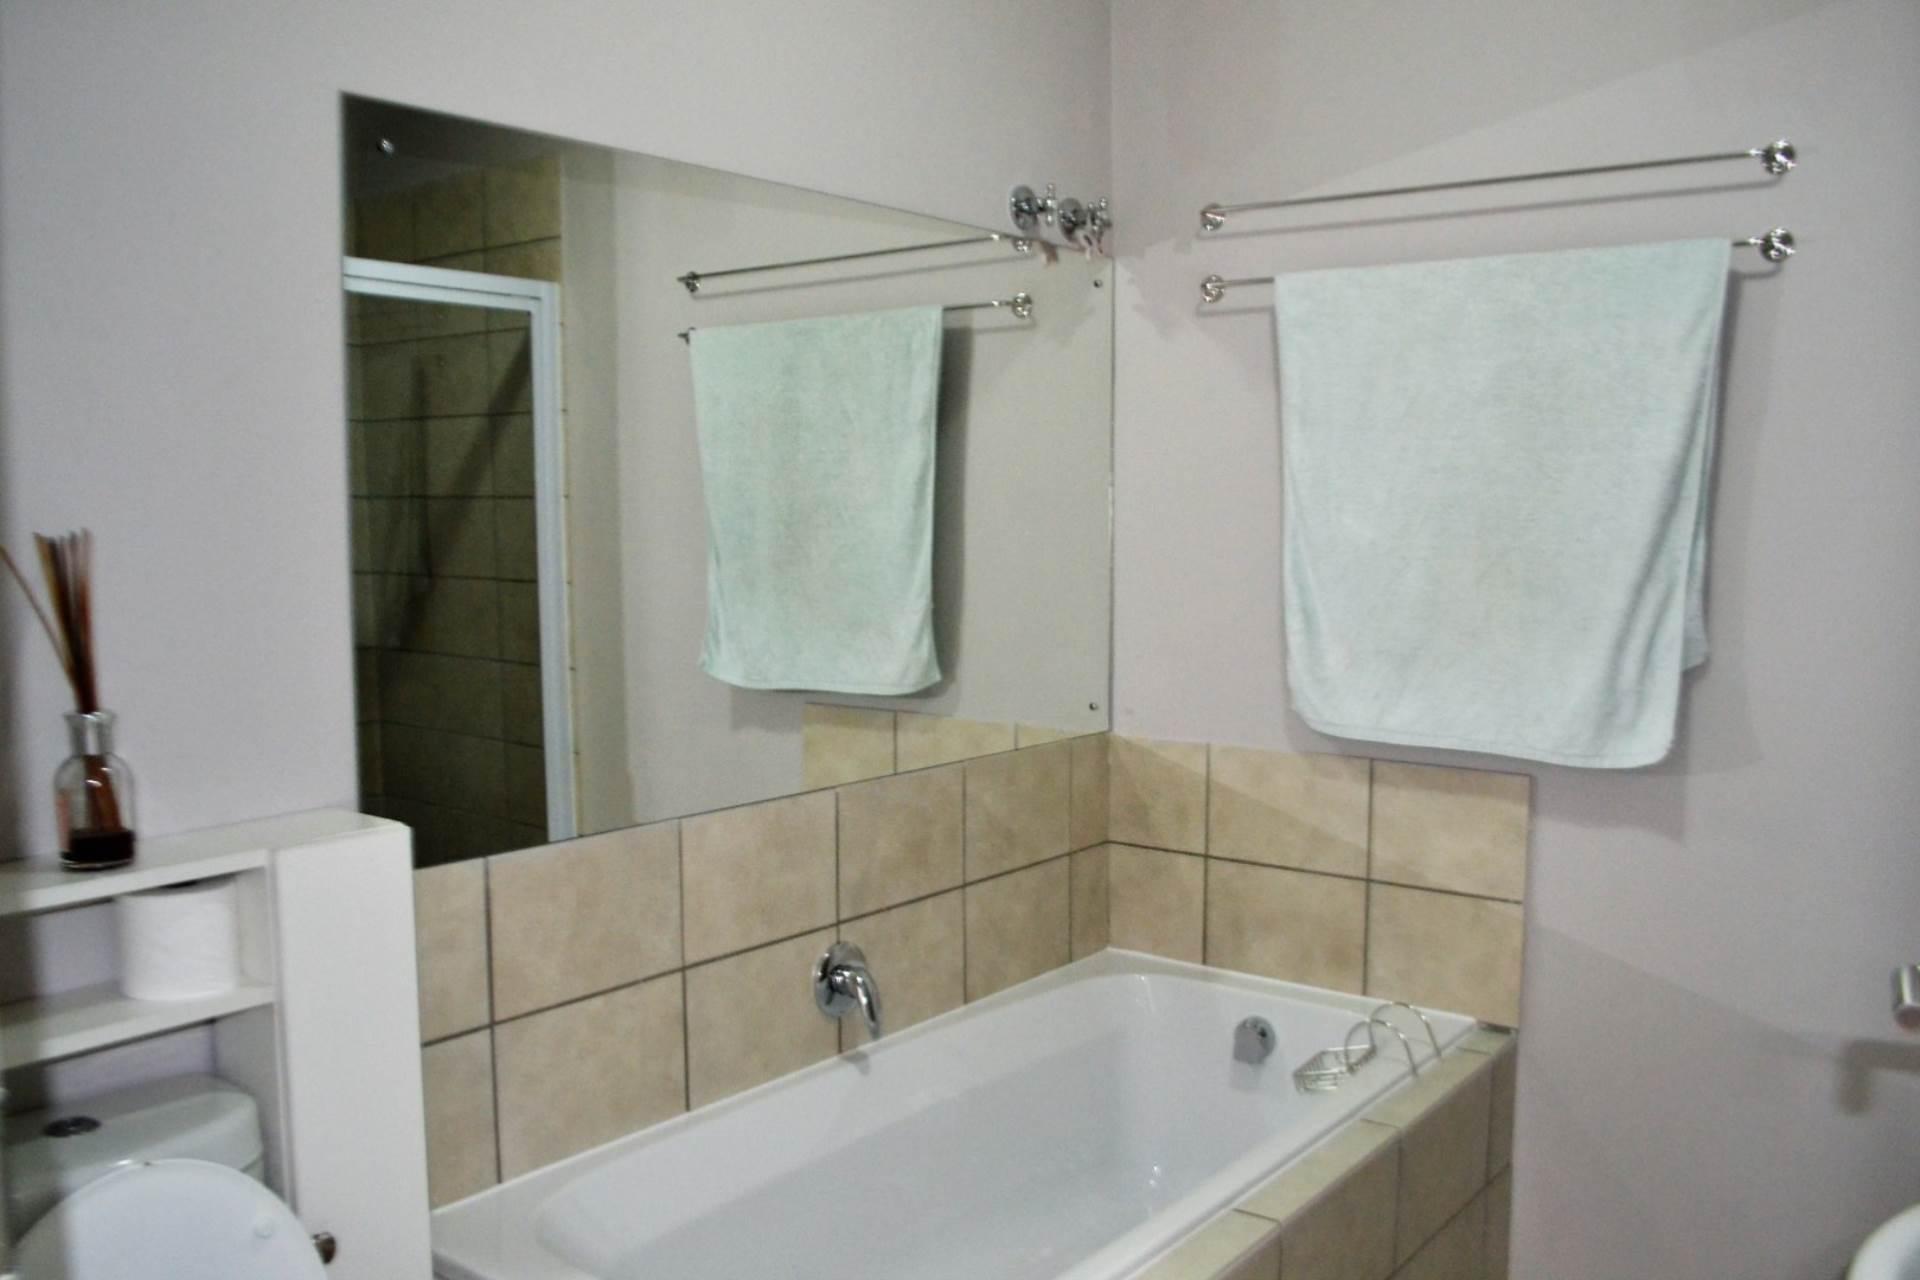 Crystallite Bathtubs And Vanities Thevote Crystallite Bathtubs